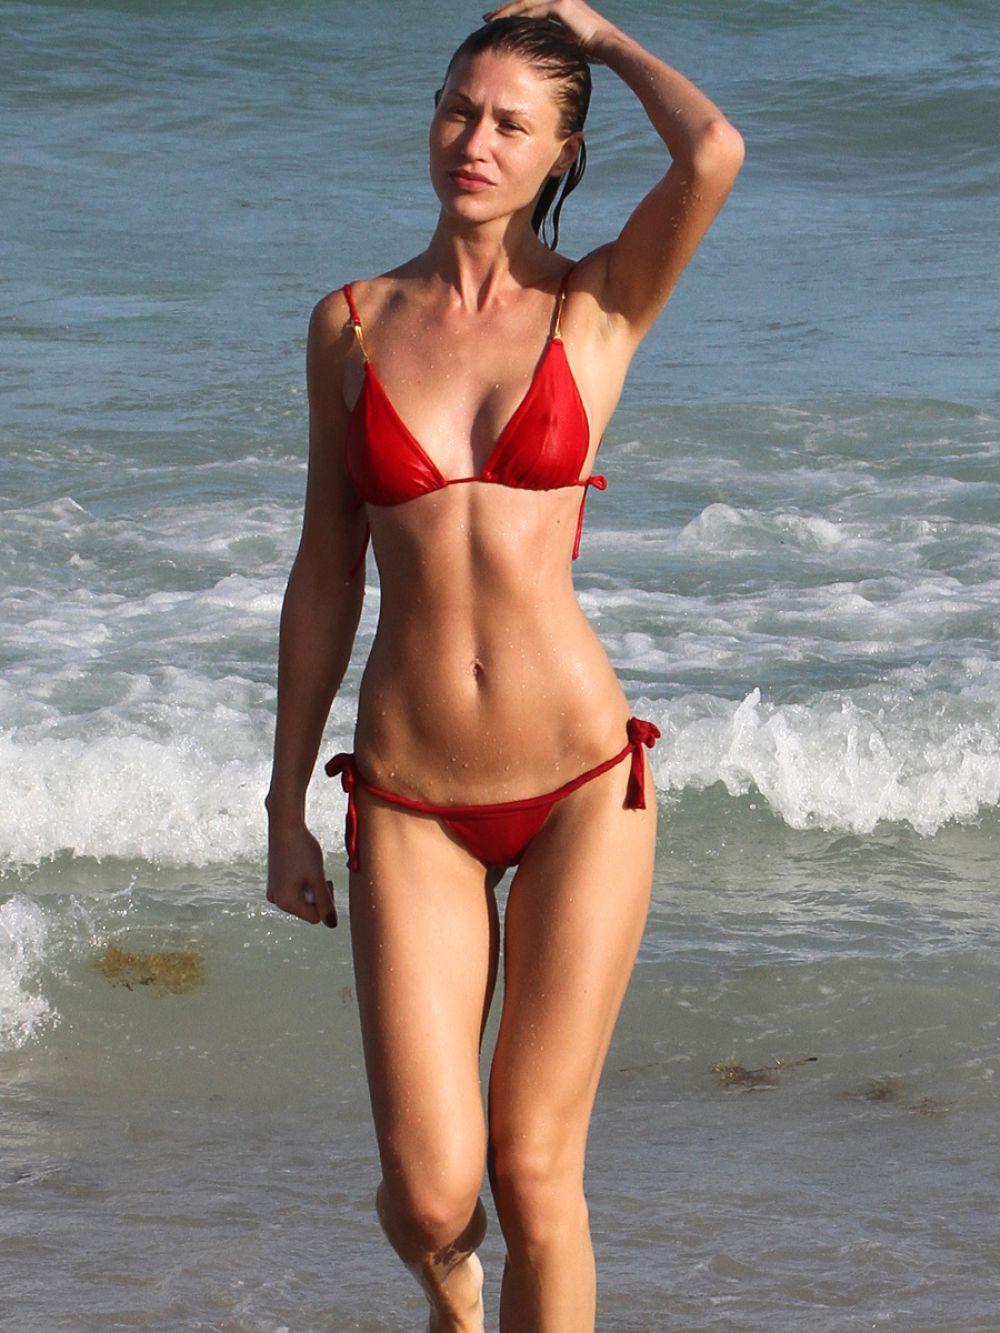 Tiny beach bikini girls